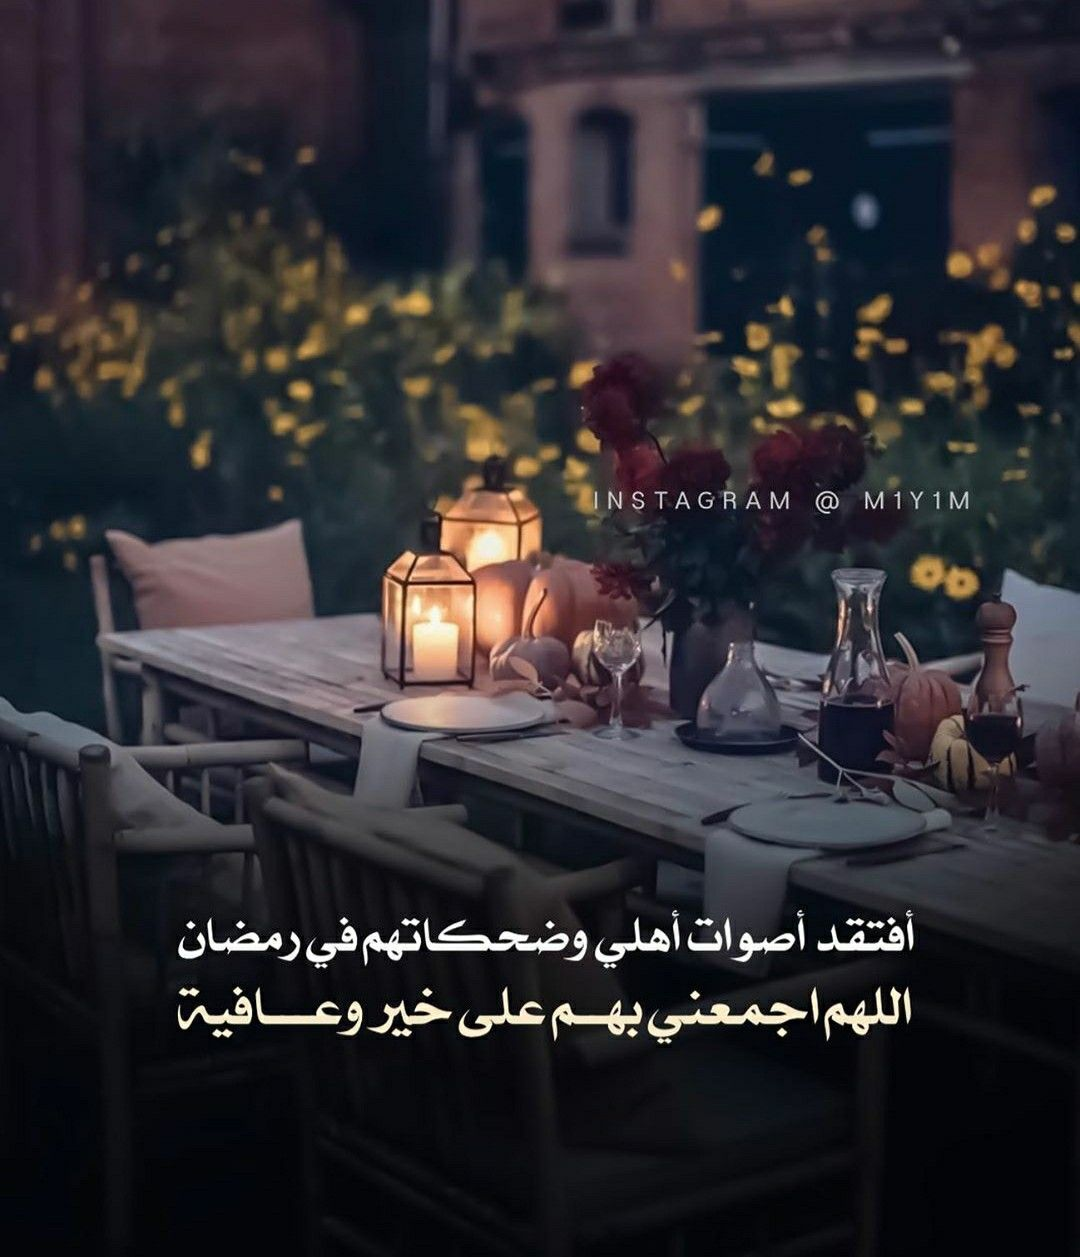 Pin By Samt On رمضان Romantic Love Quotes Ramadan Kareem Table Decorations